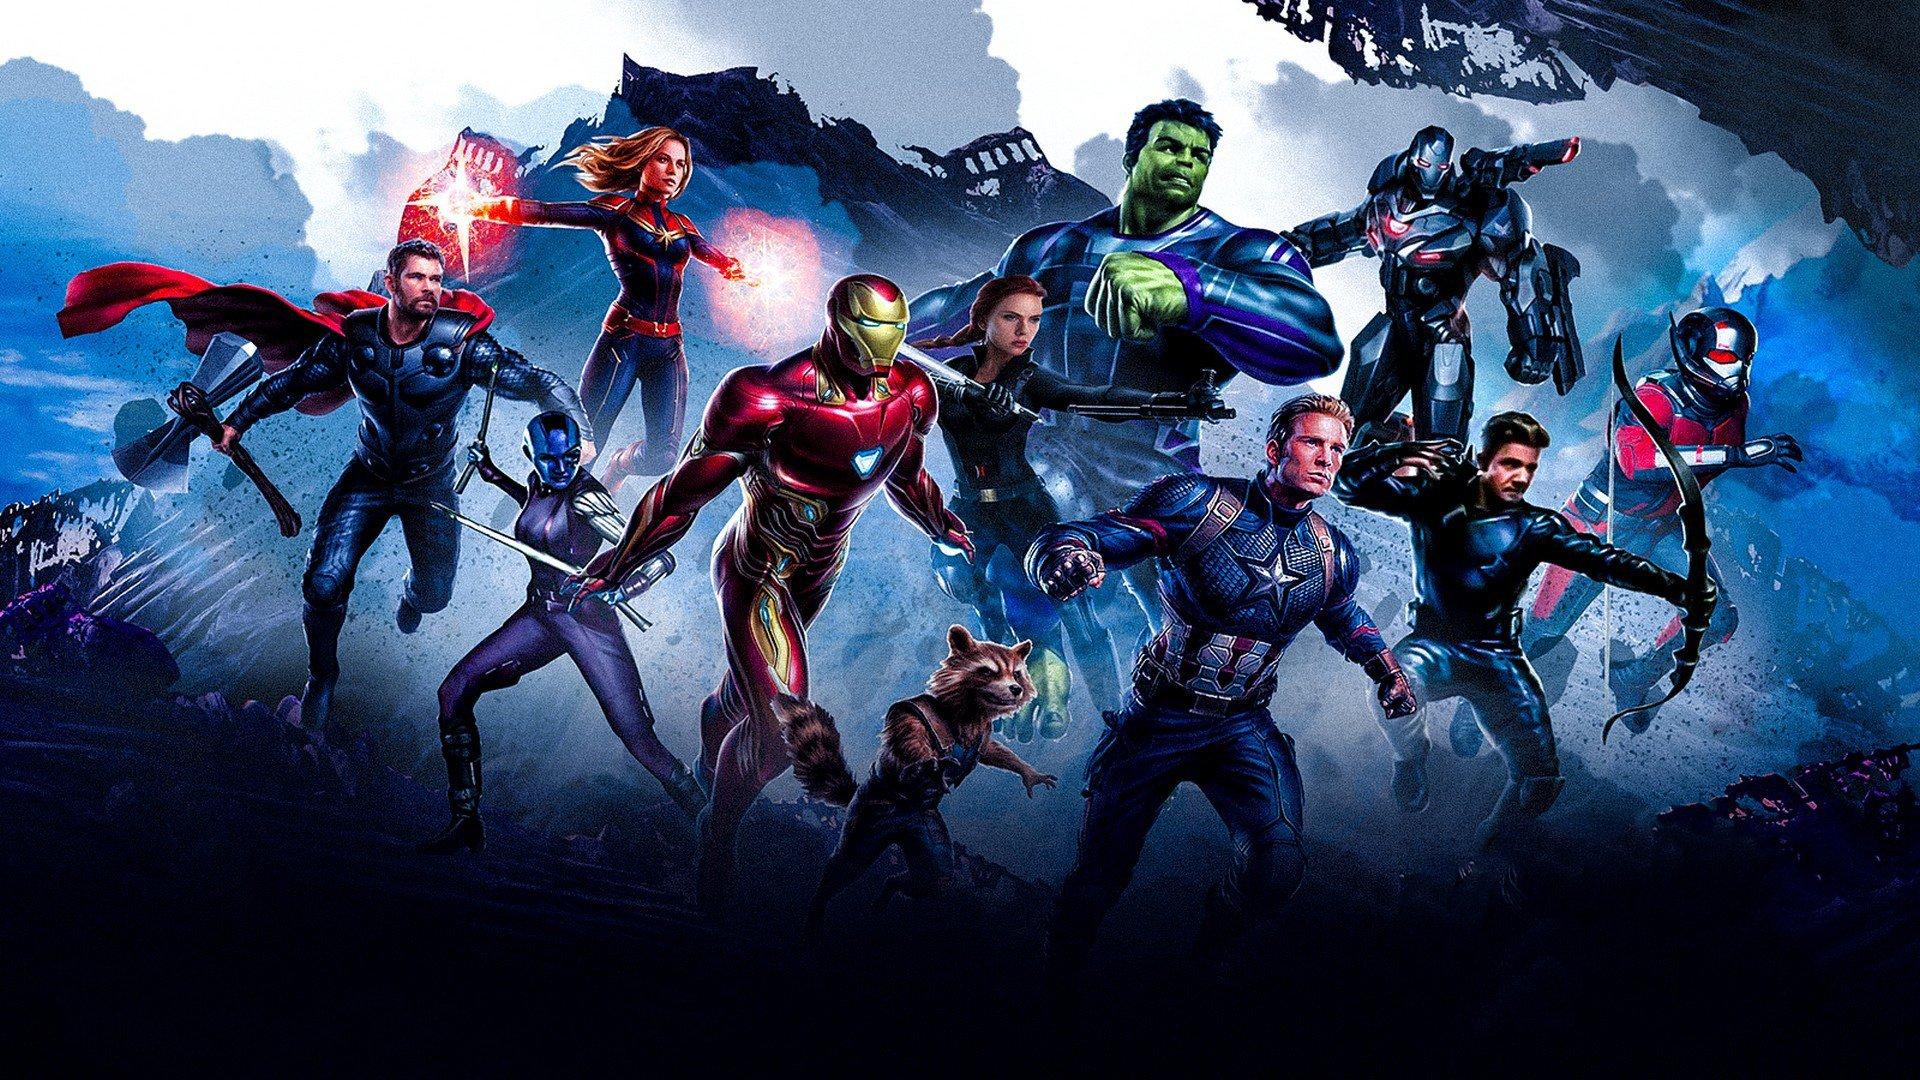 Avengers Endgame Hd Wallpaper Background Image 1920x1080 Id